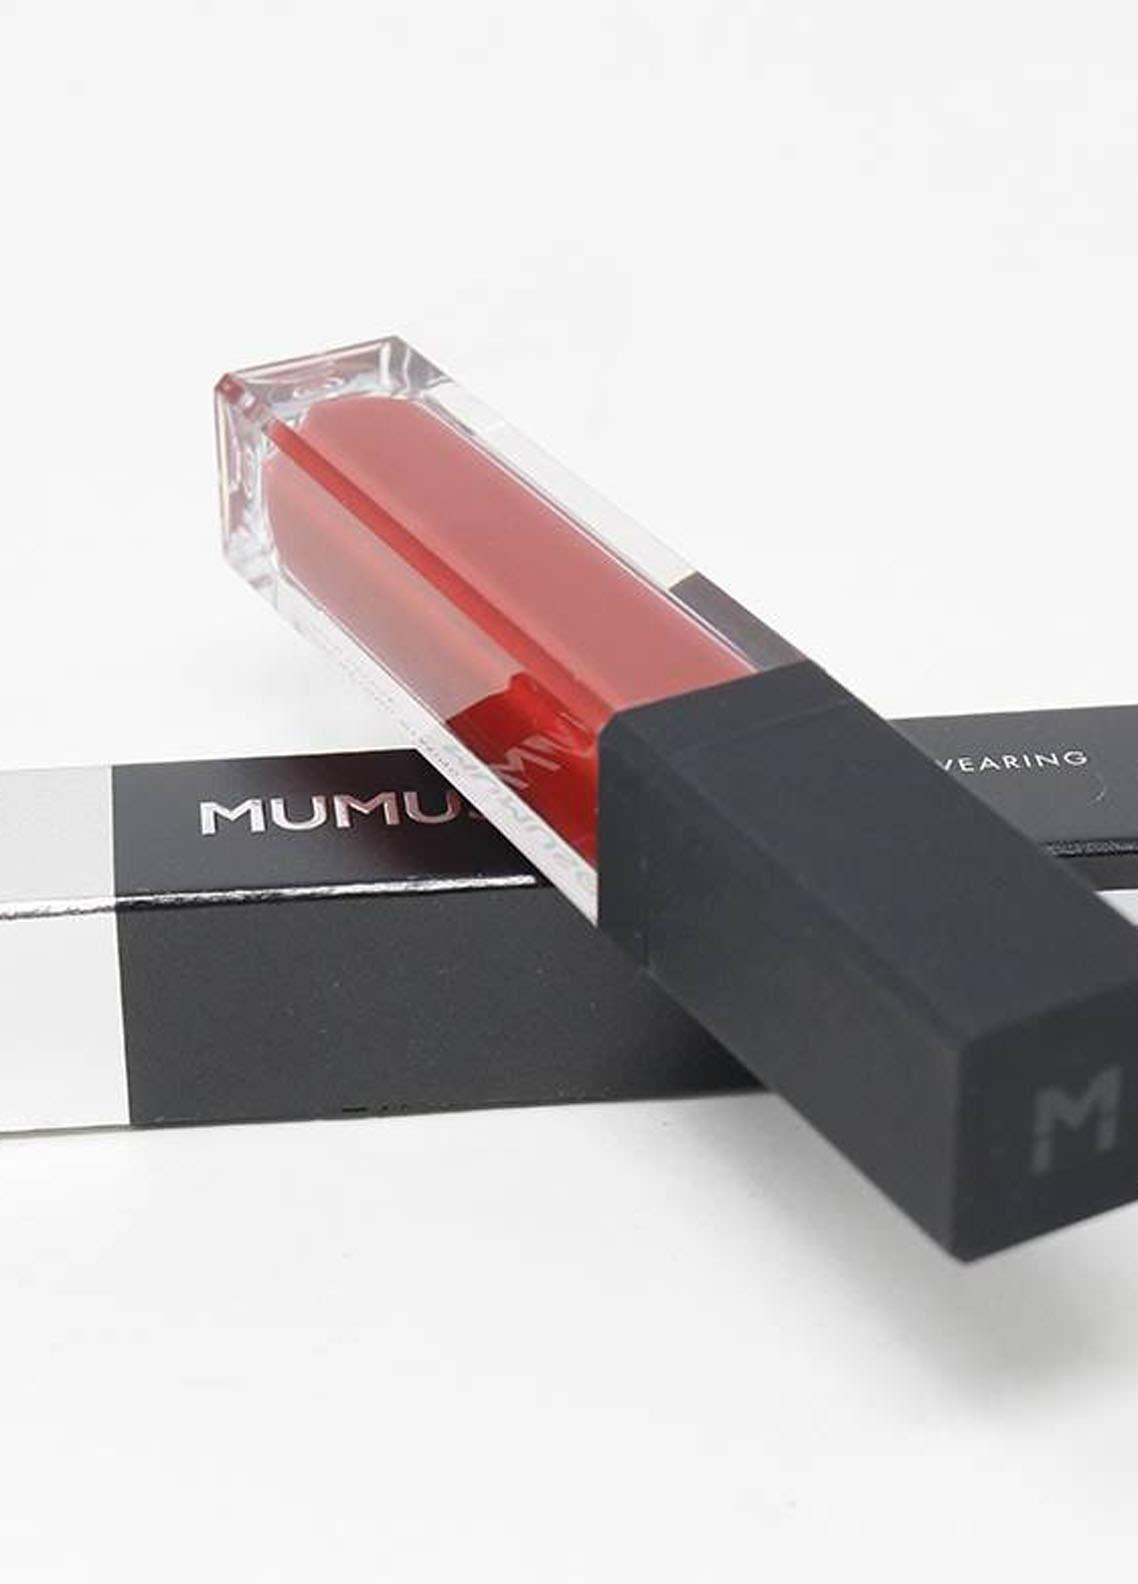 Mumuso Adore Me Long Wearing Liquid Lipstick